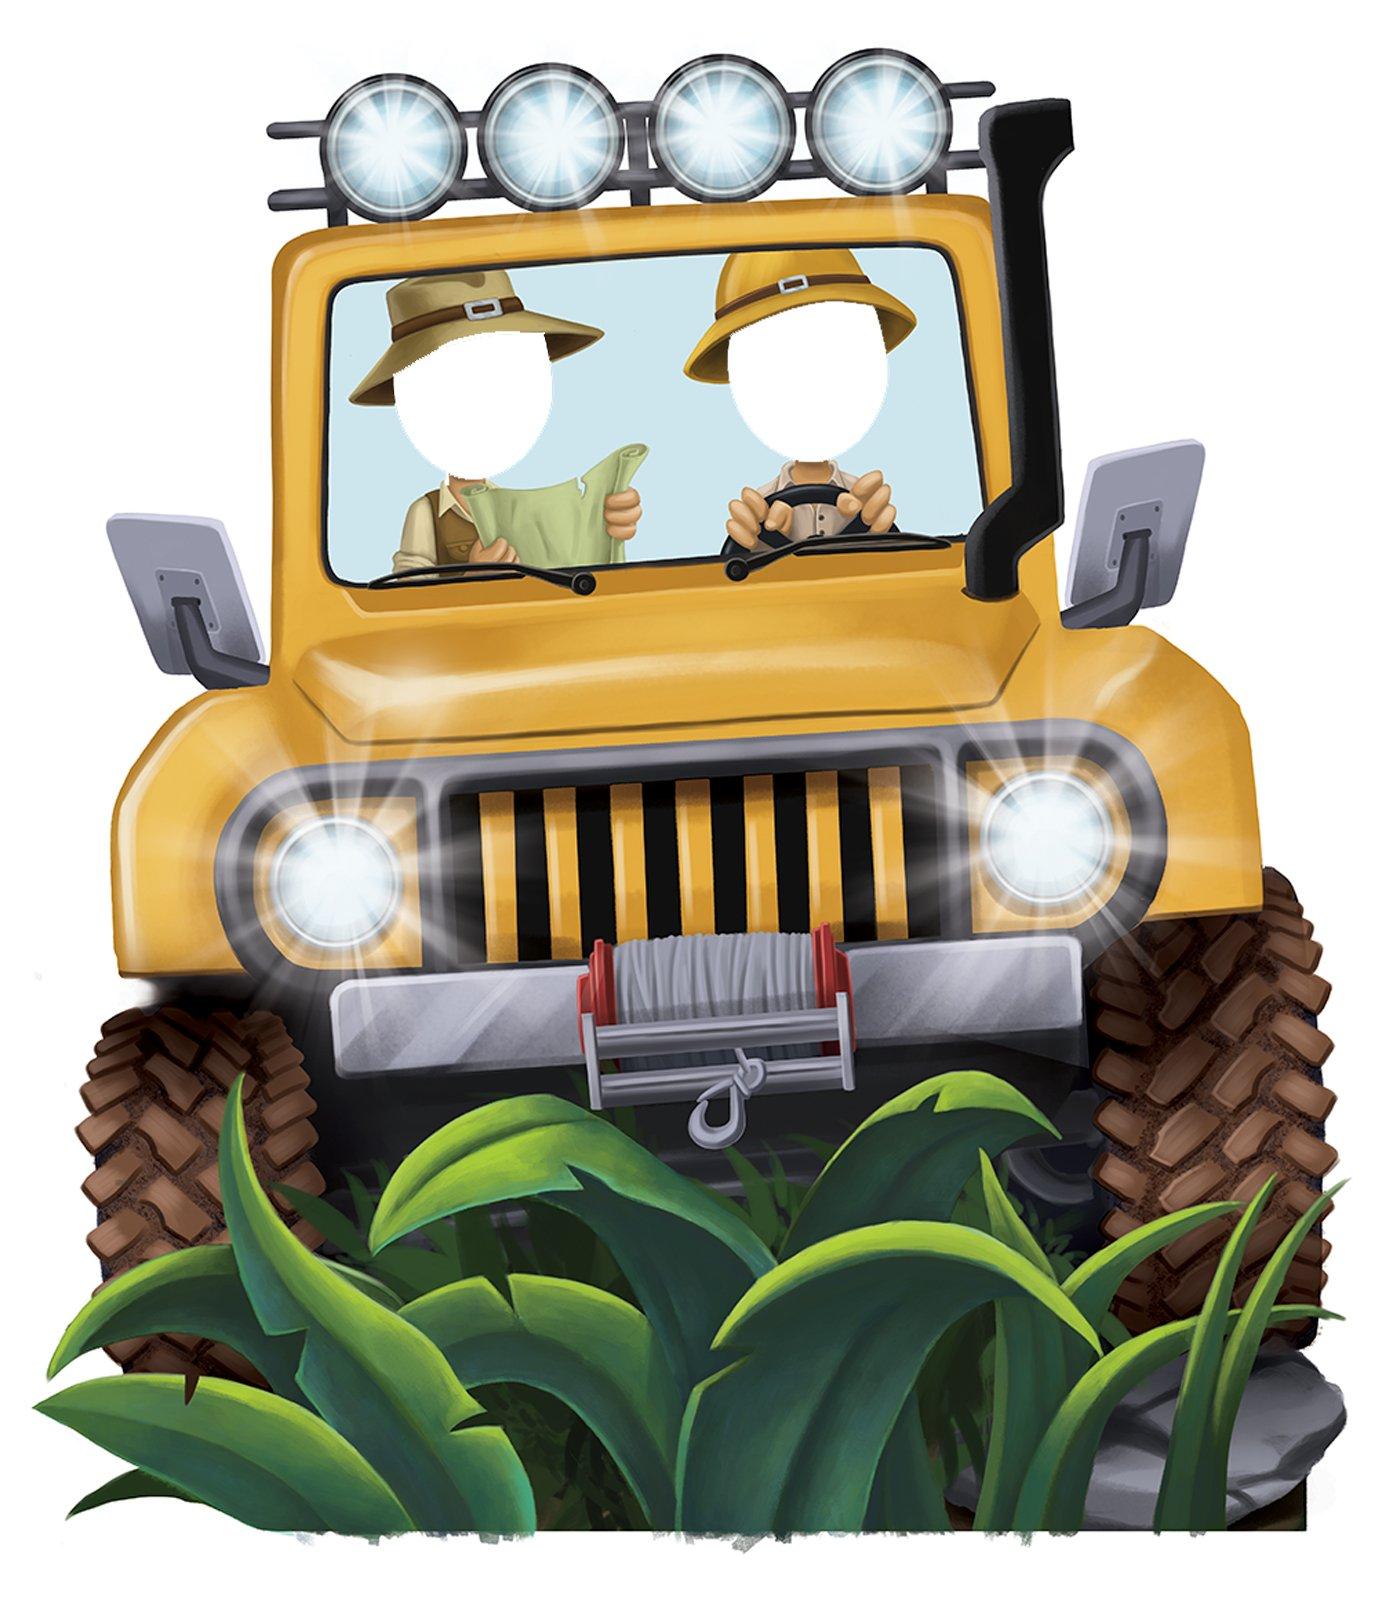 BirthdayExpress Jungle Room Decor - Jeep Cardboard Standup